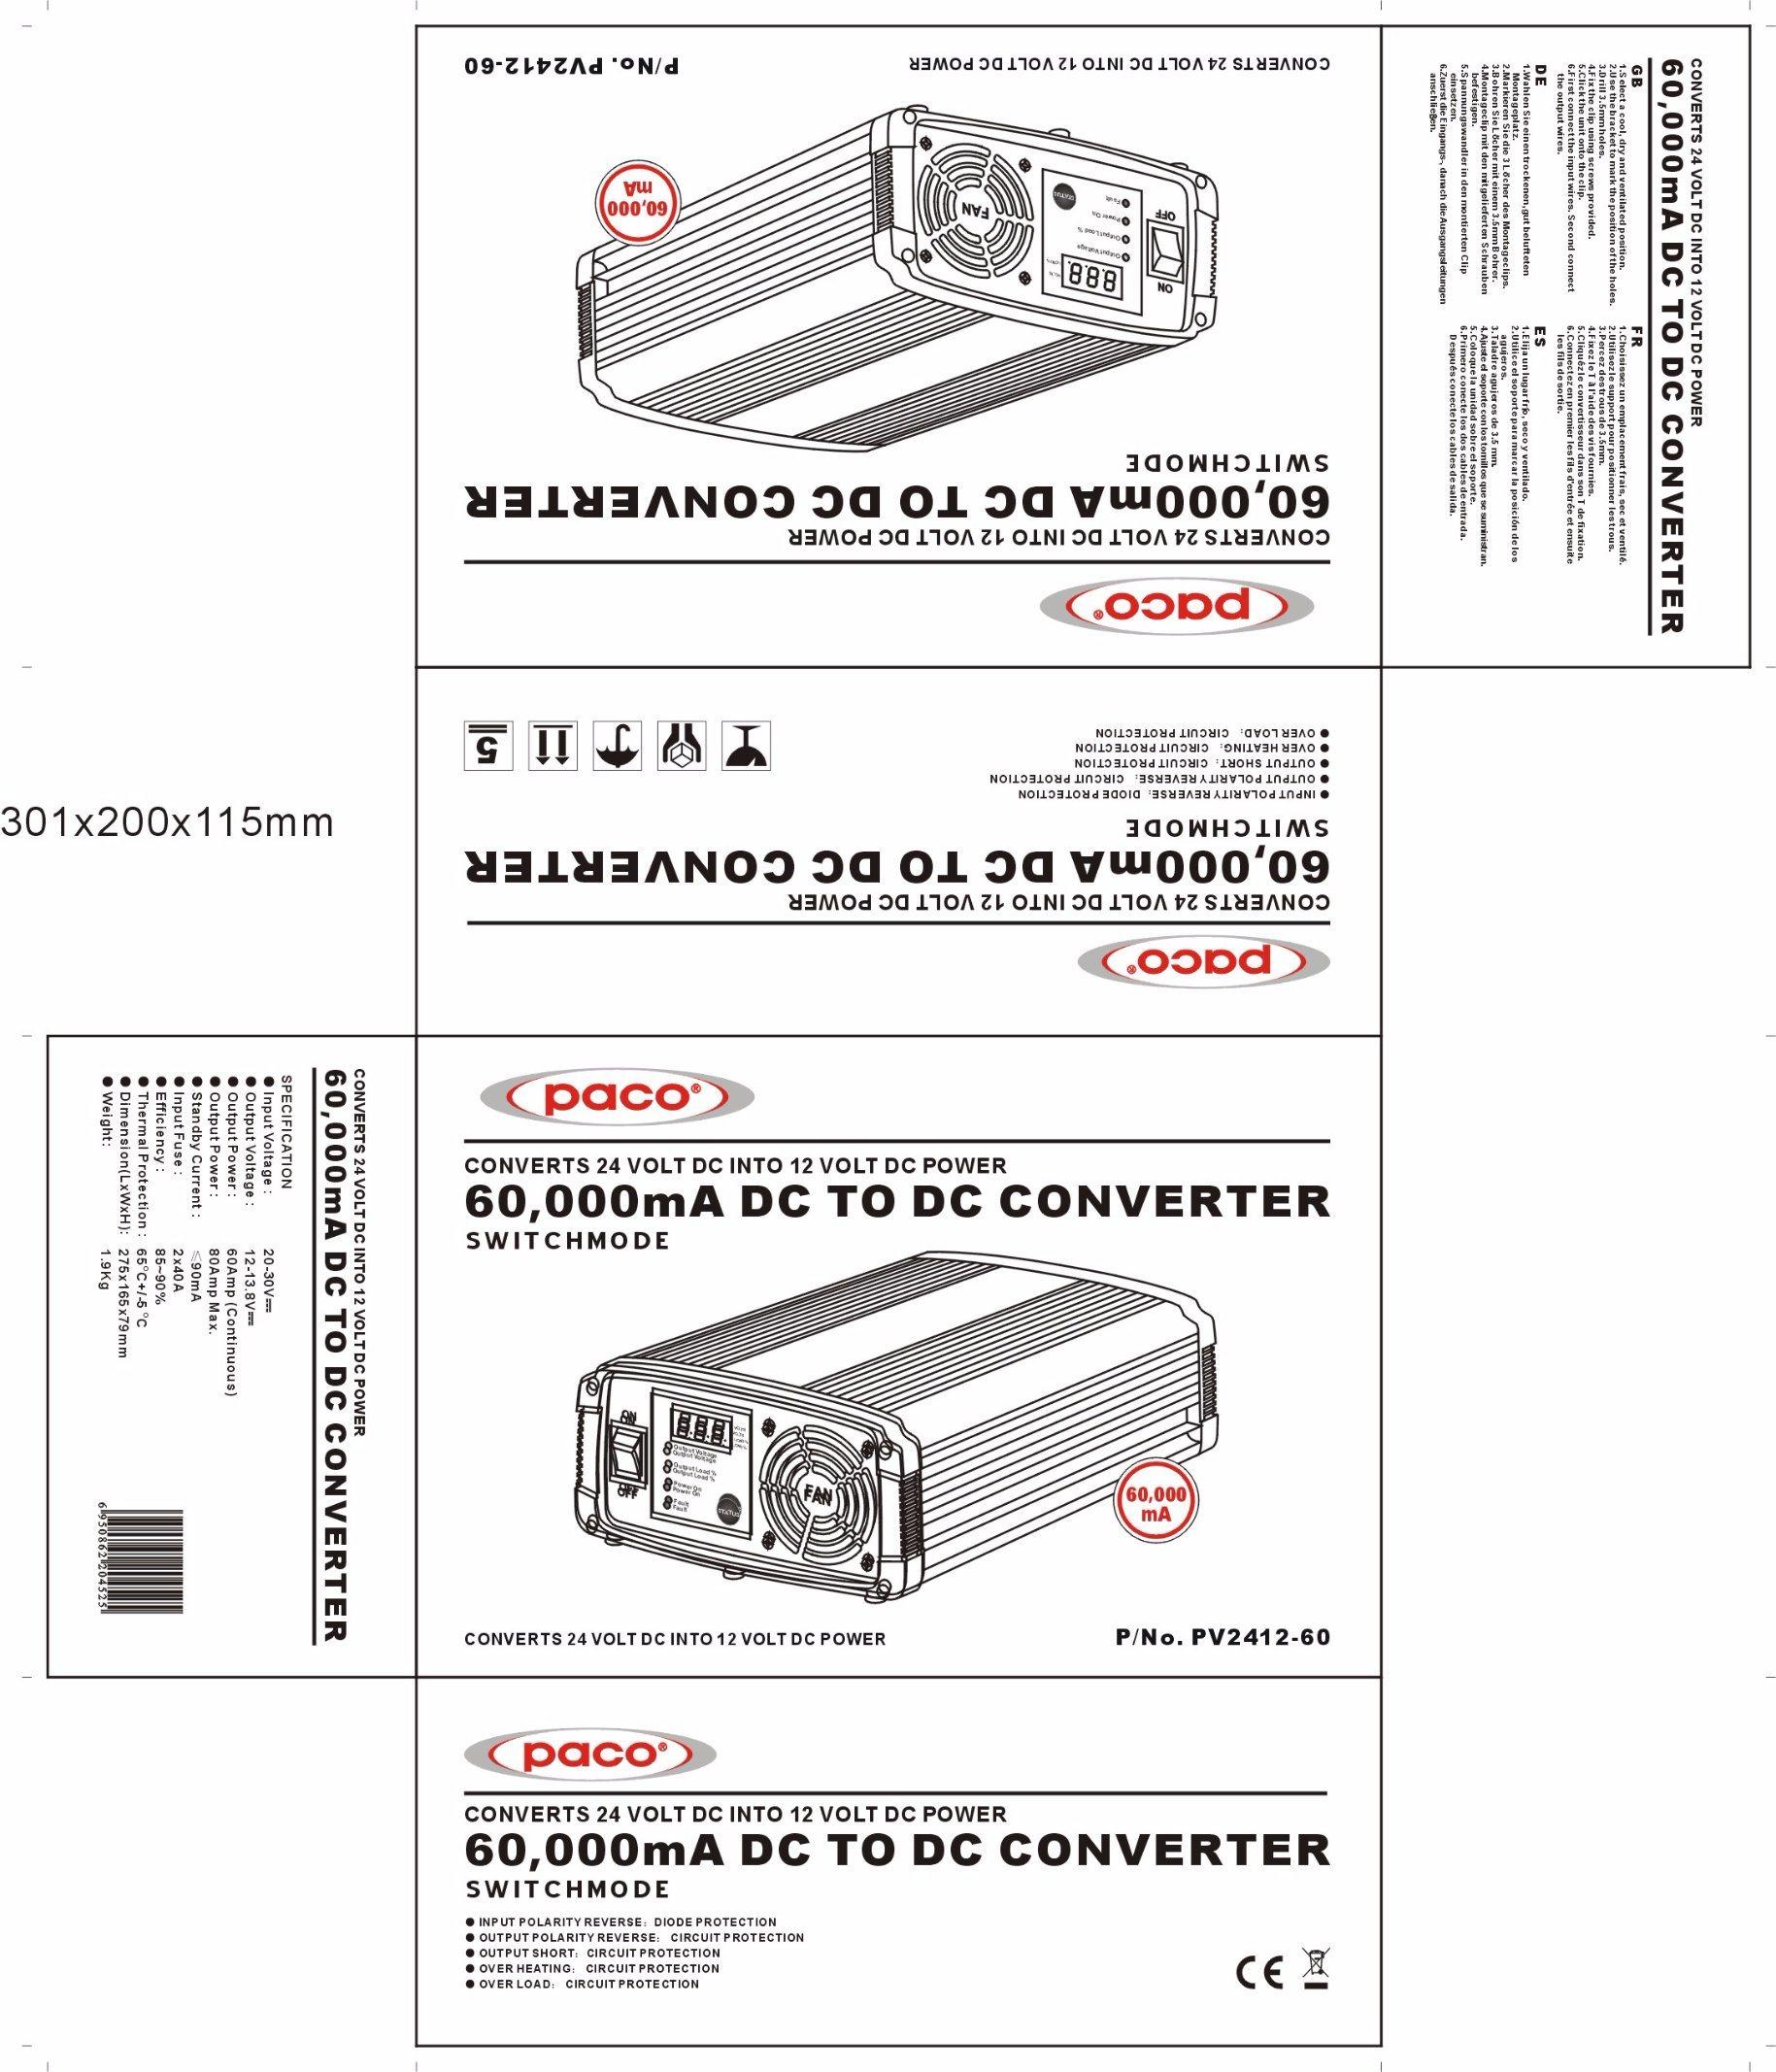 China Professional Dc To Converter 24v 12v 60a Digital Display 6 12 Volt Paco Ligao